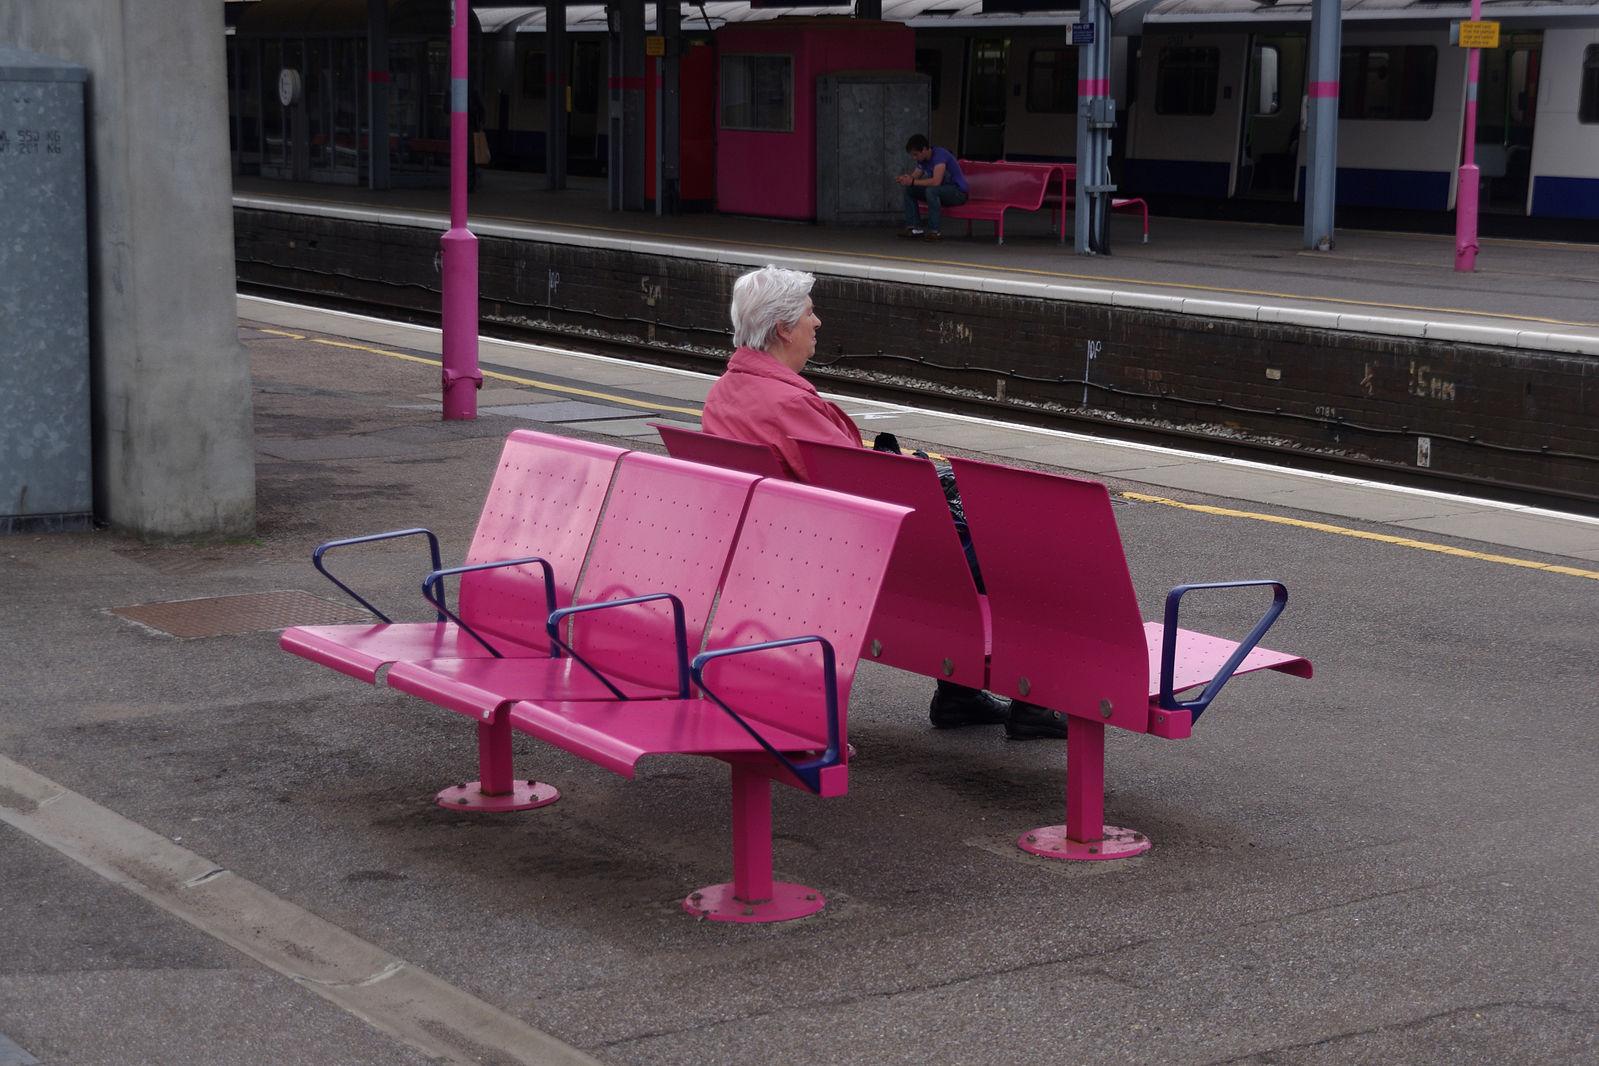 Upminster_station_MMB_02